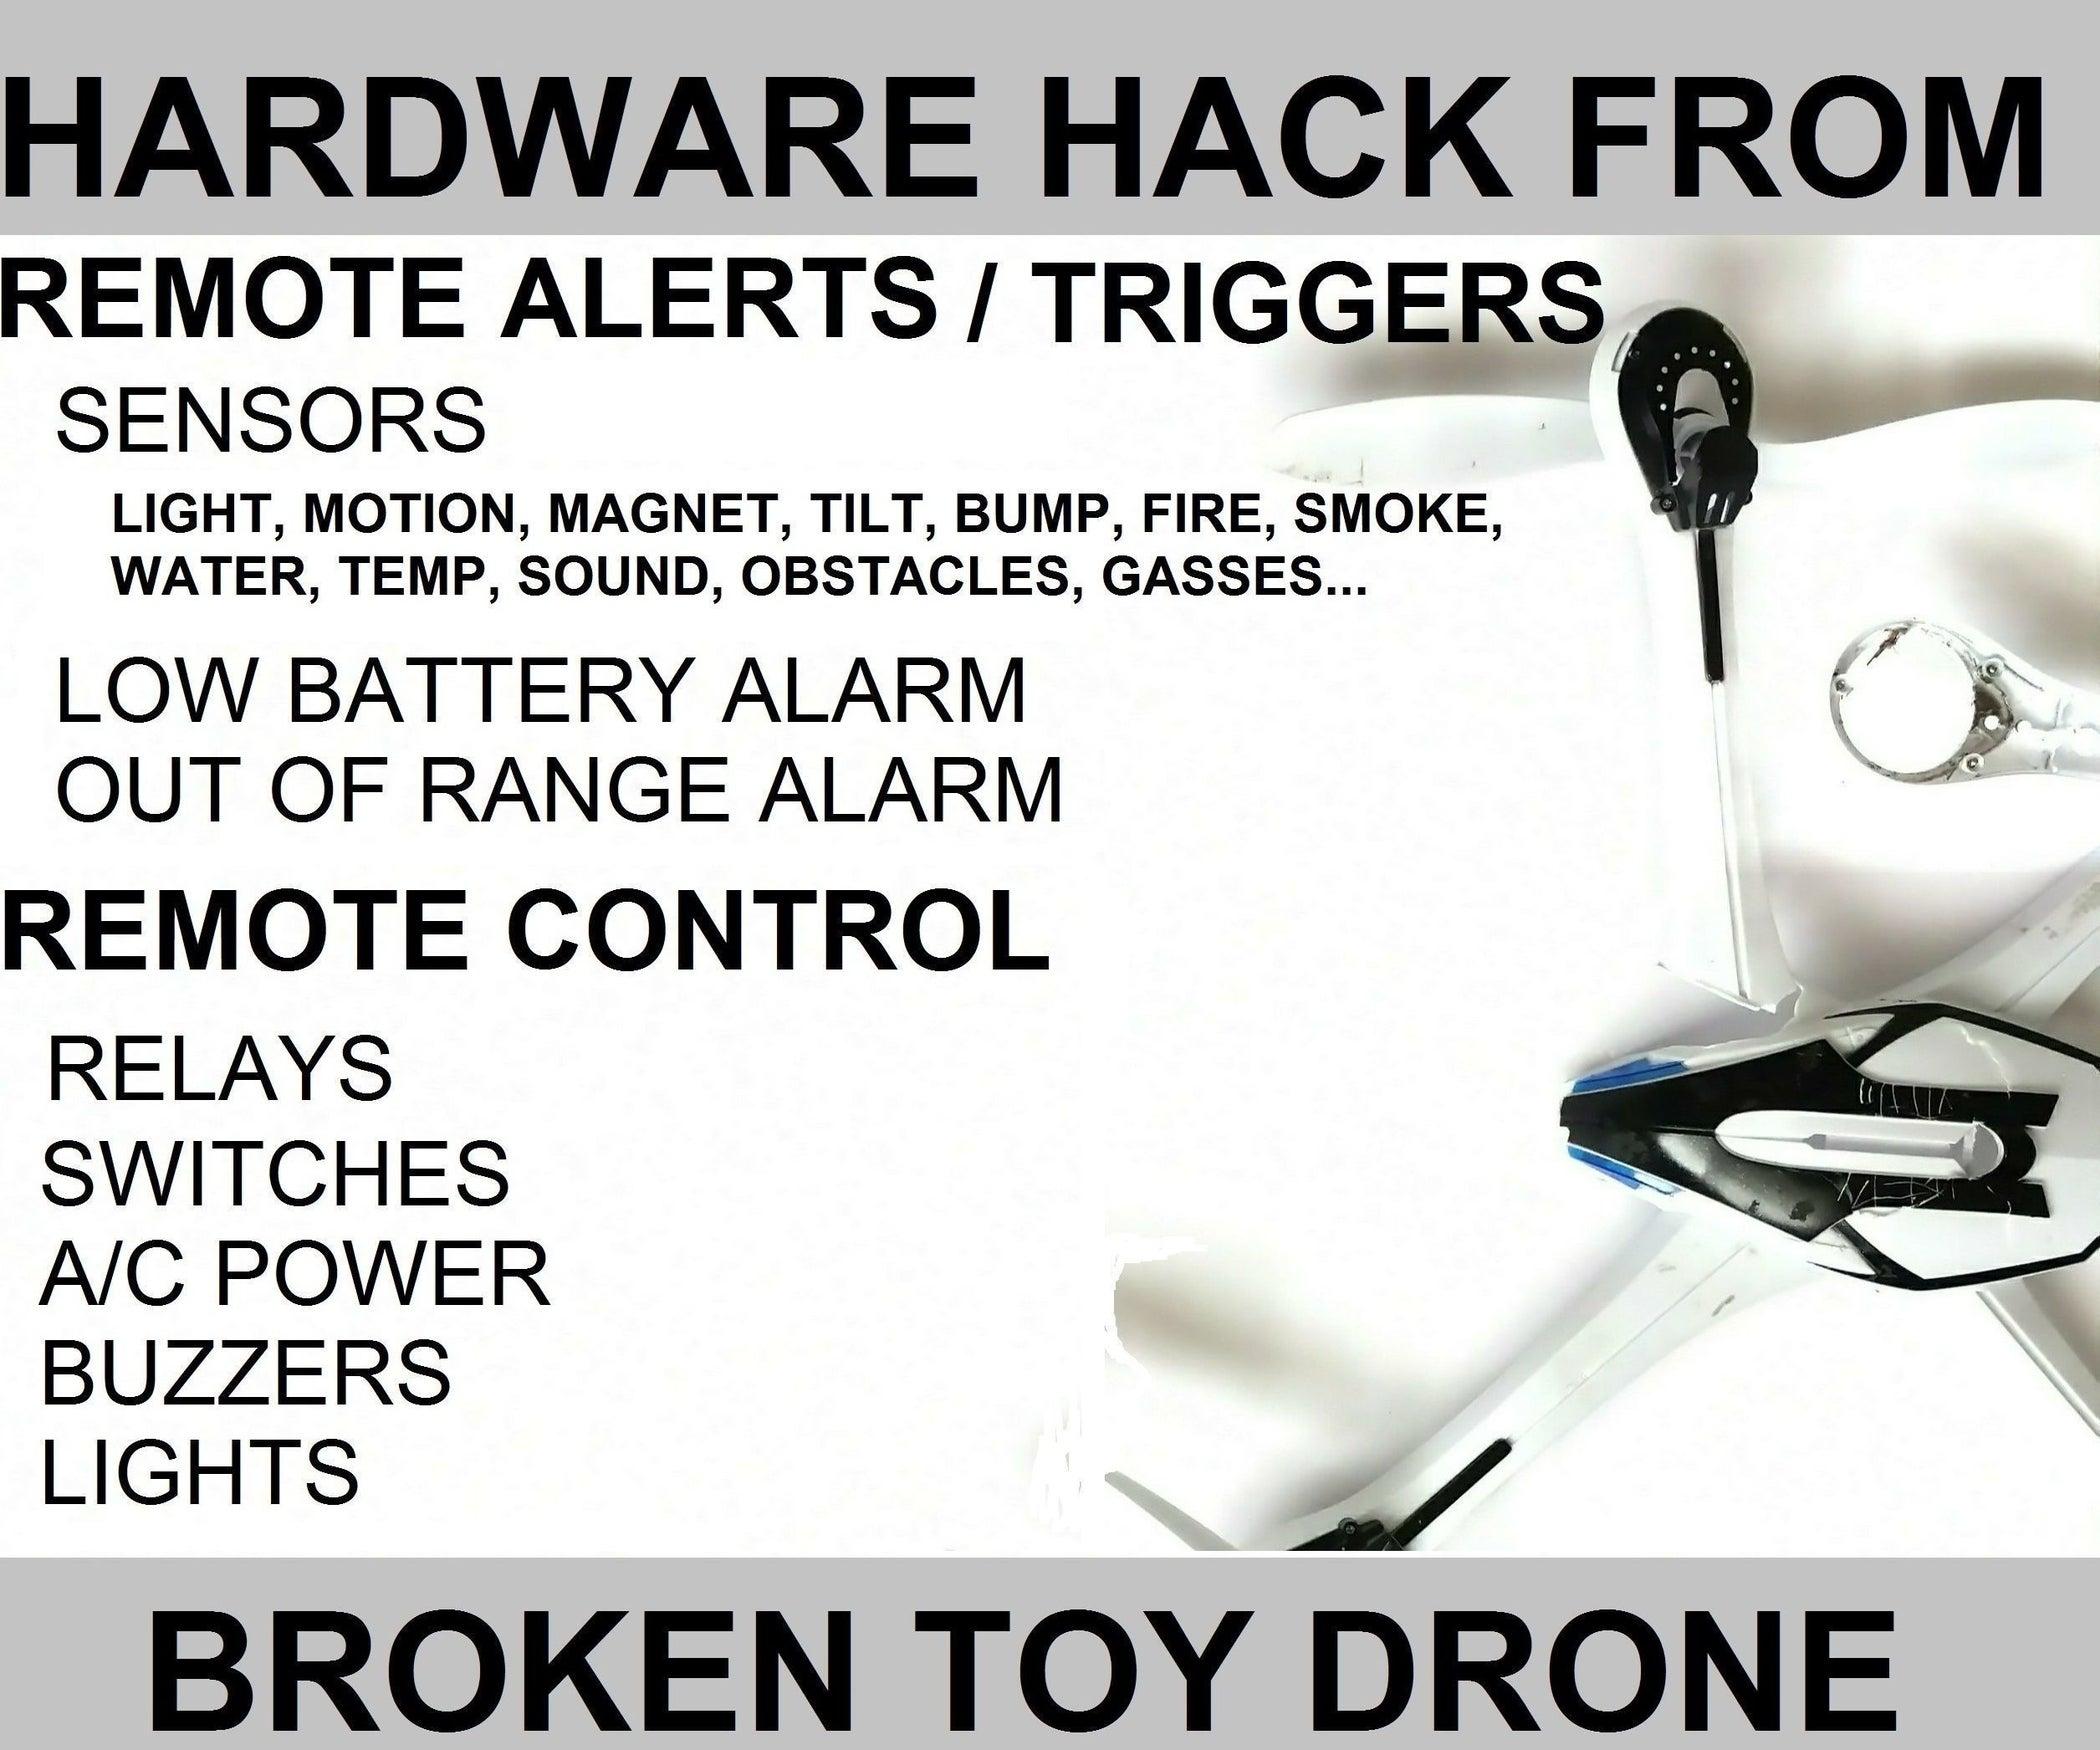 Broken Toy Drone Hardware Hack 12 Steps With Pictures Door Knob Touch Alarm Circuit Controlcircuit Diagram